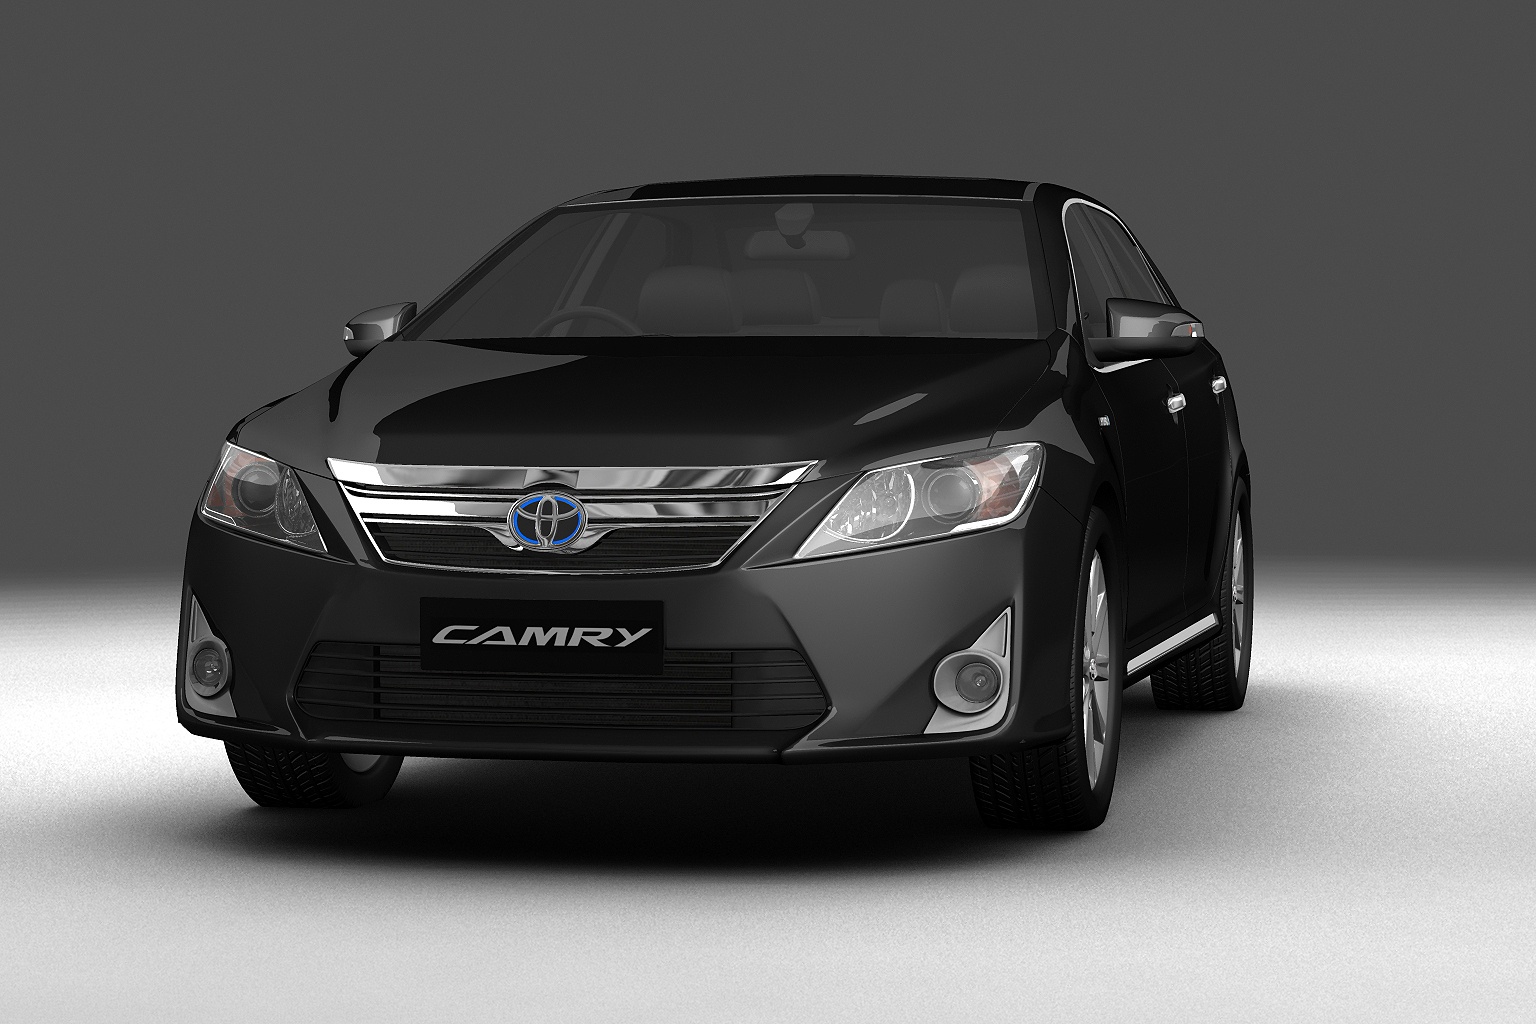 2012 toyota camry model 3d hybrid (asian) 3ds max fbx c4d lwo hrc xsi obj 136188